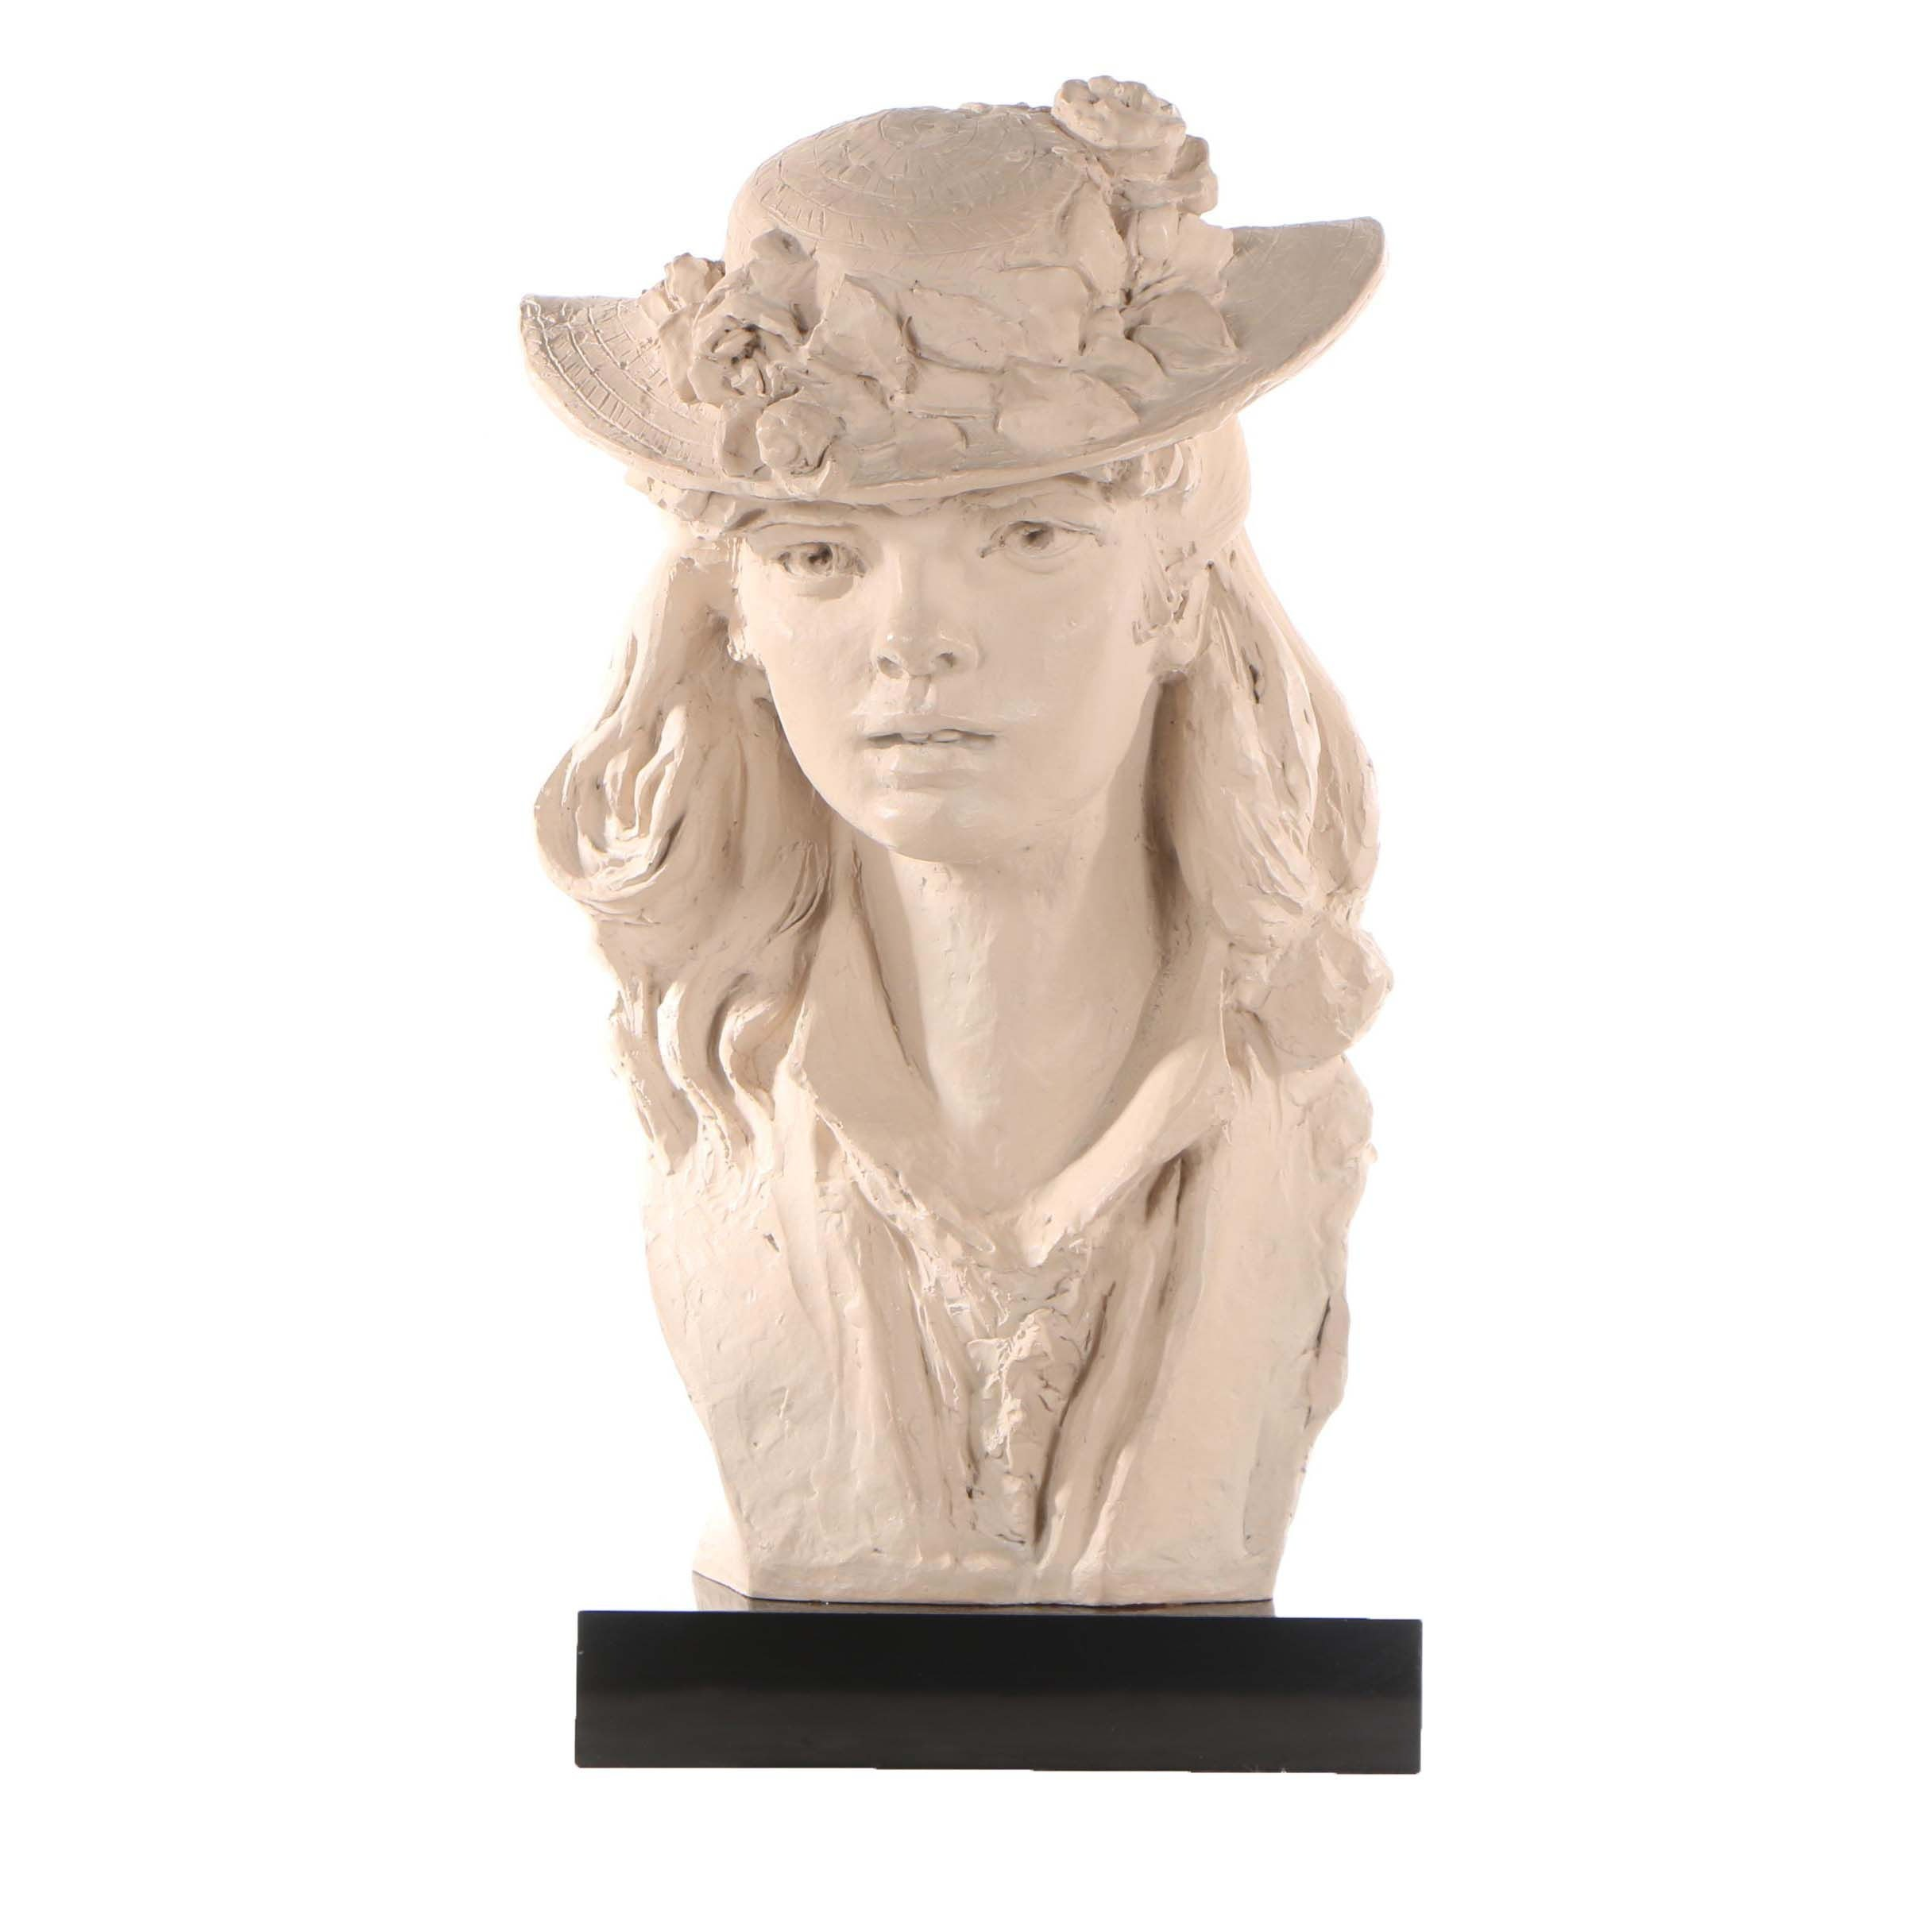 "Austin Productions Resin Sculpture after Rodin ""Rose Beuret"""